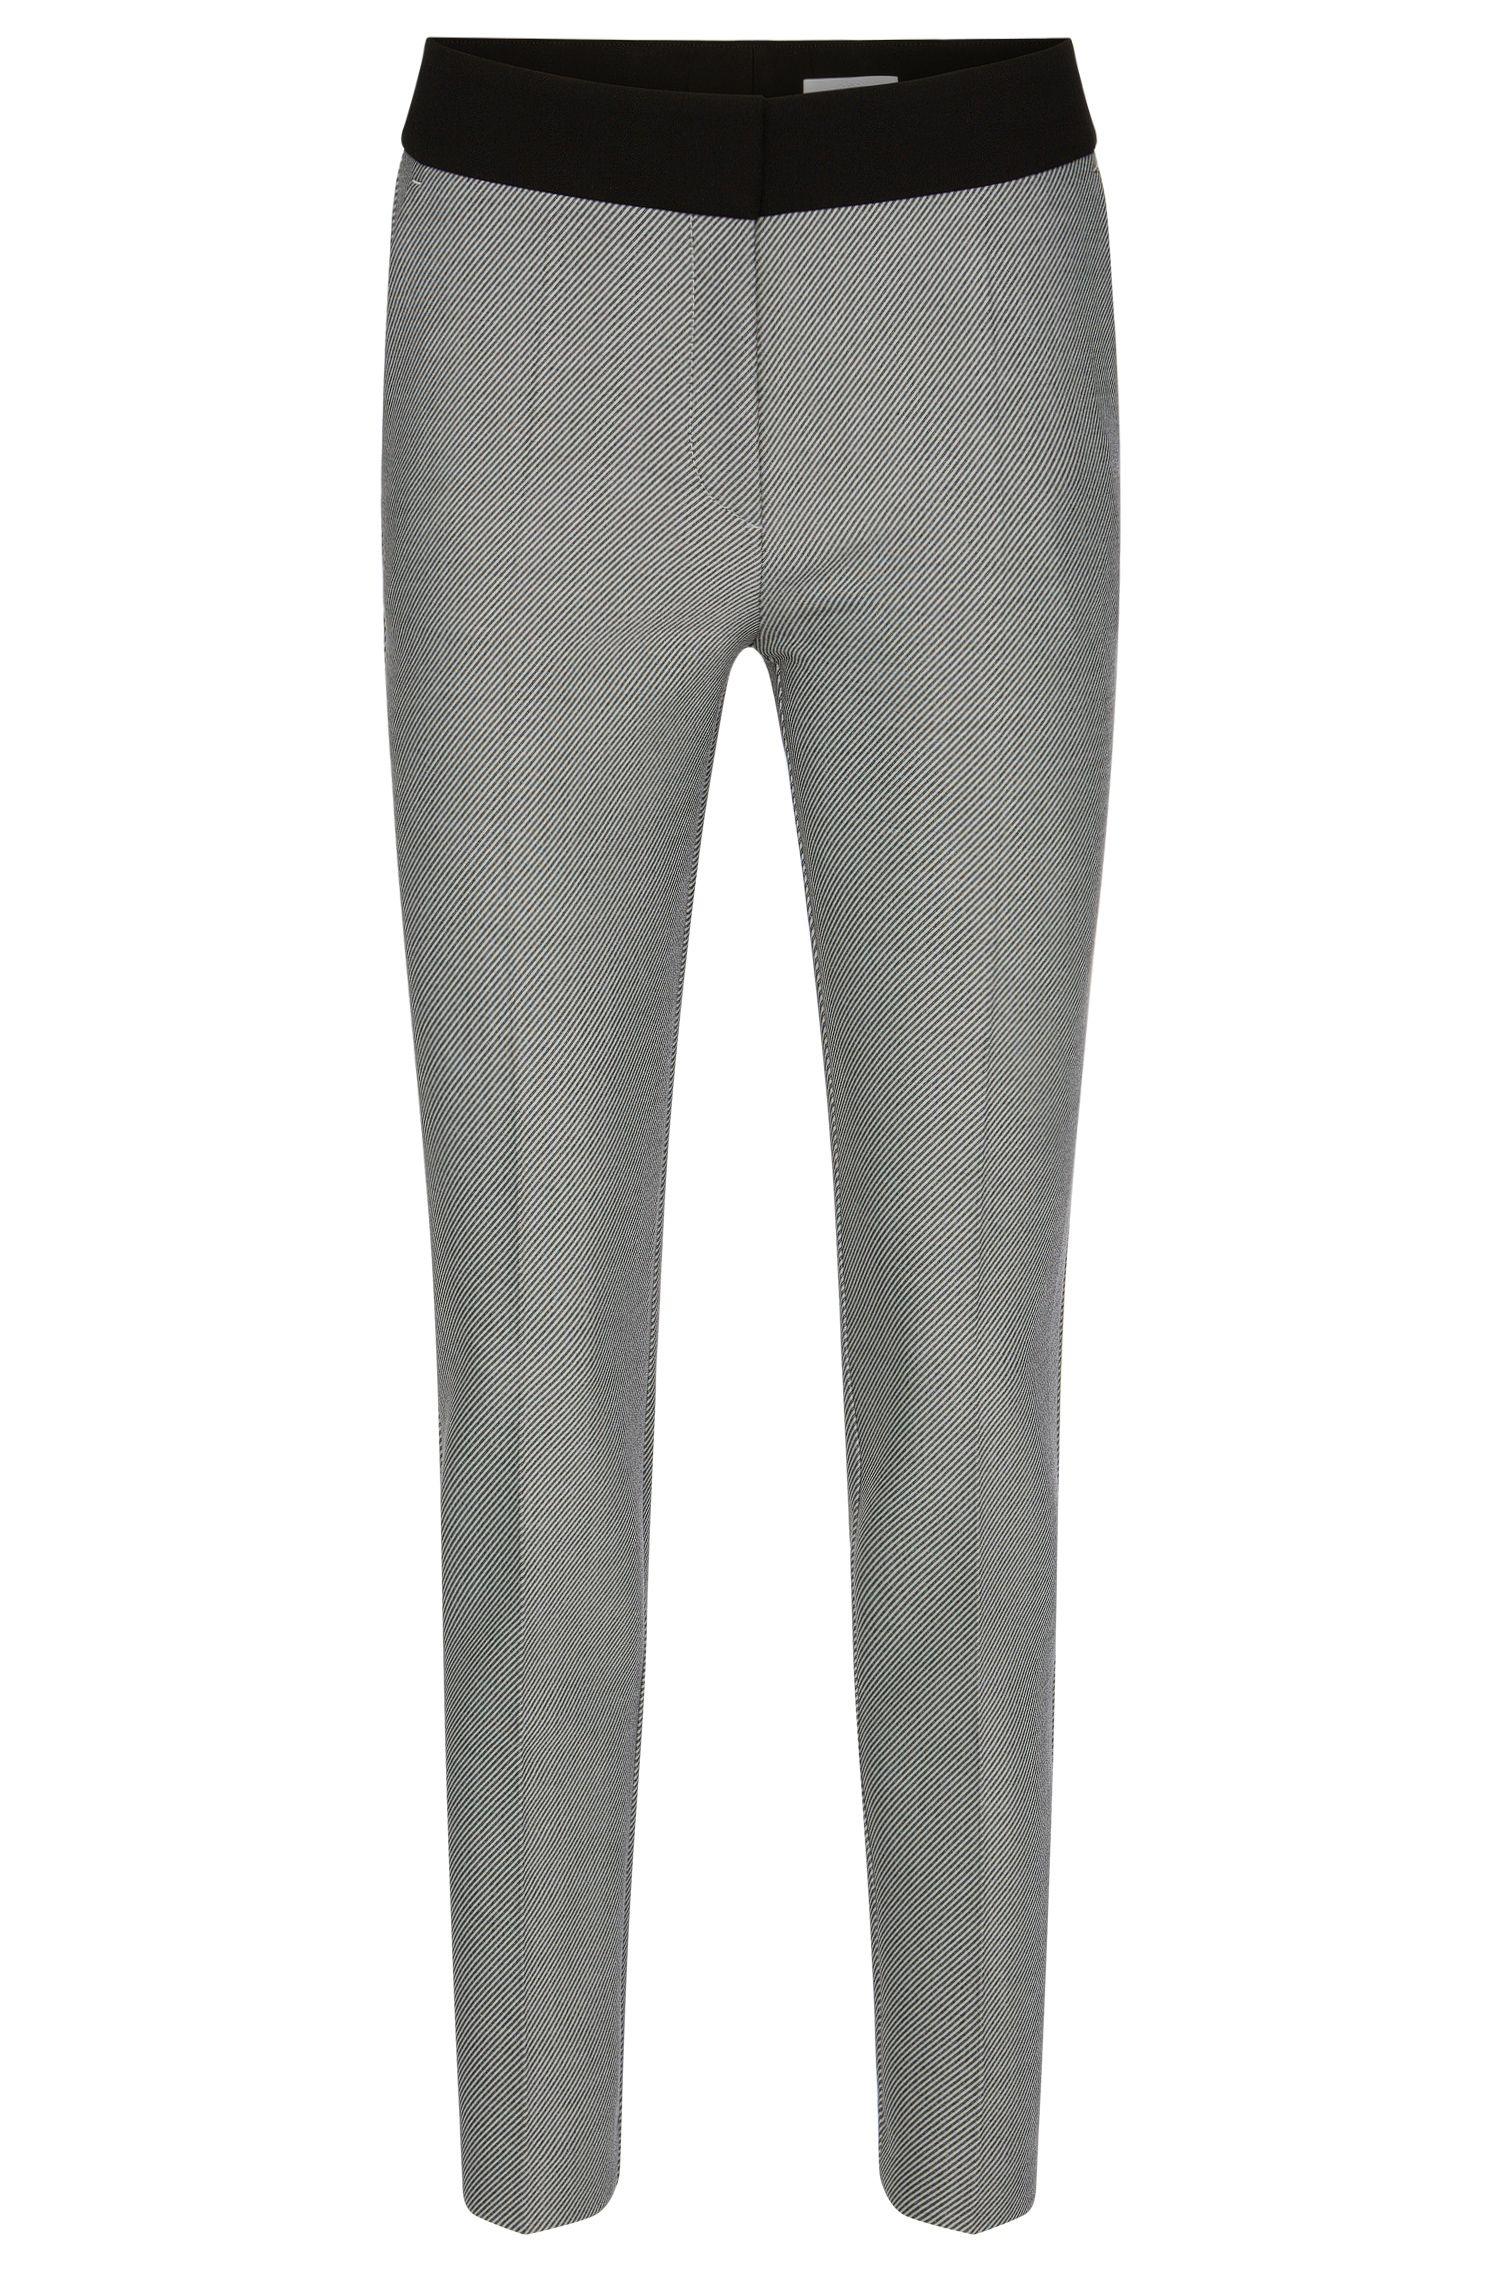 Diagonaal gestreepte slim-fit broek met effen band: 'Acnella'